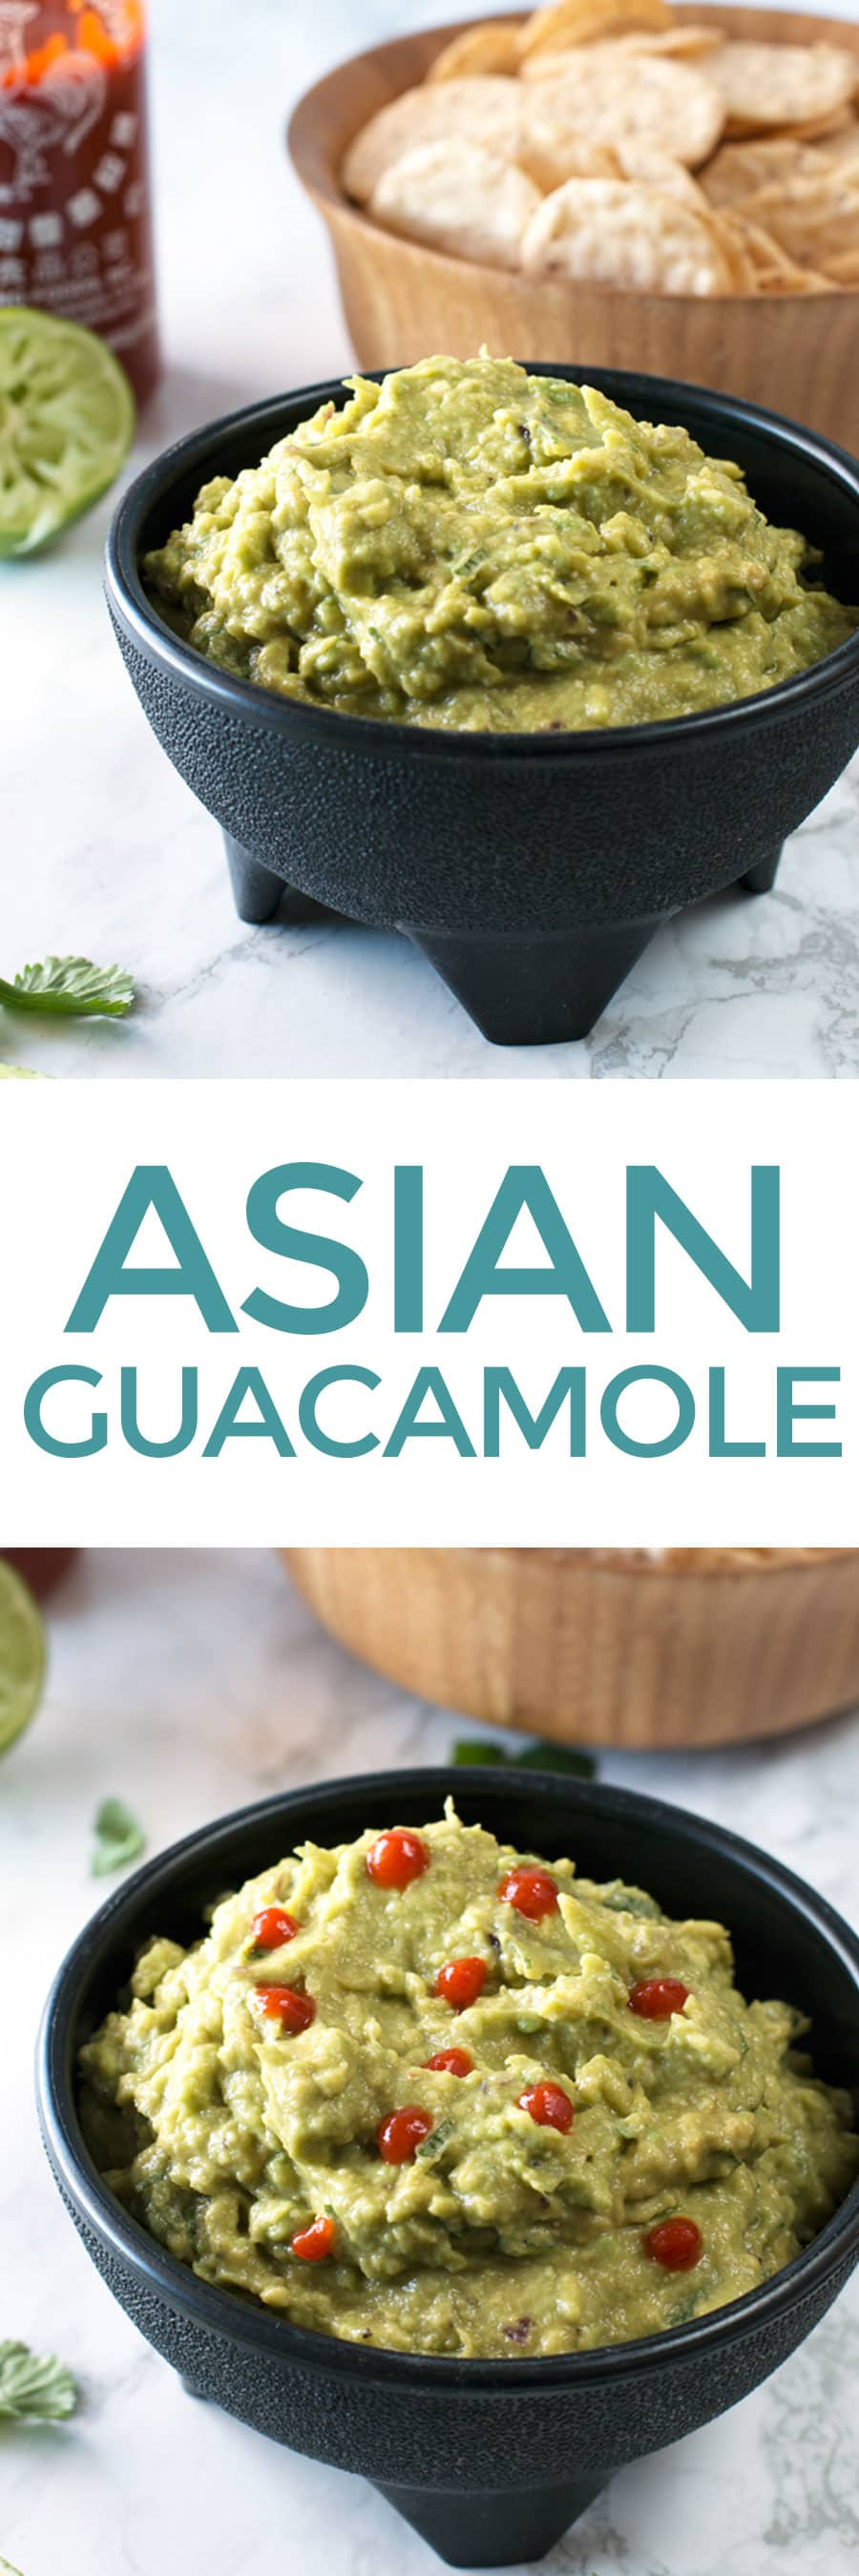 asian guacamole | cakenknife.com